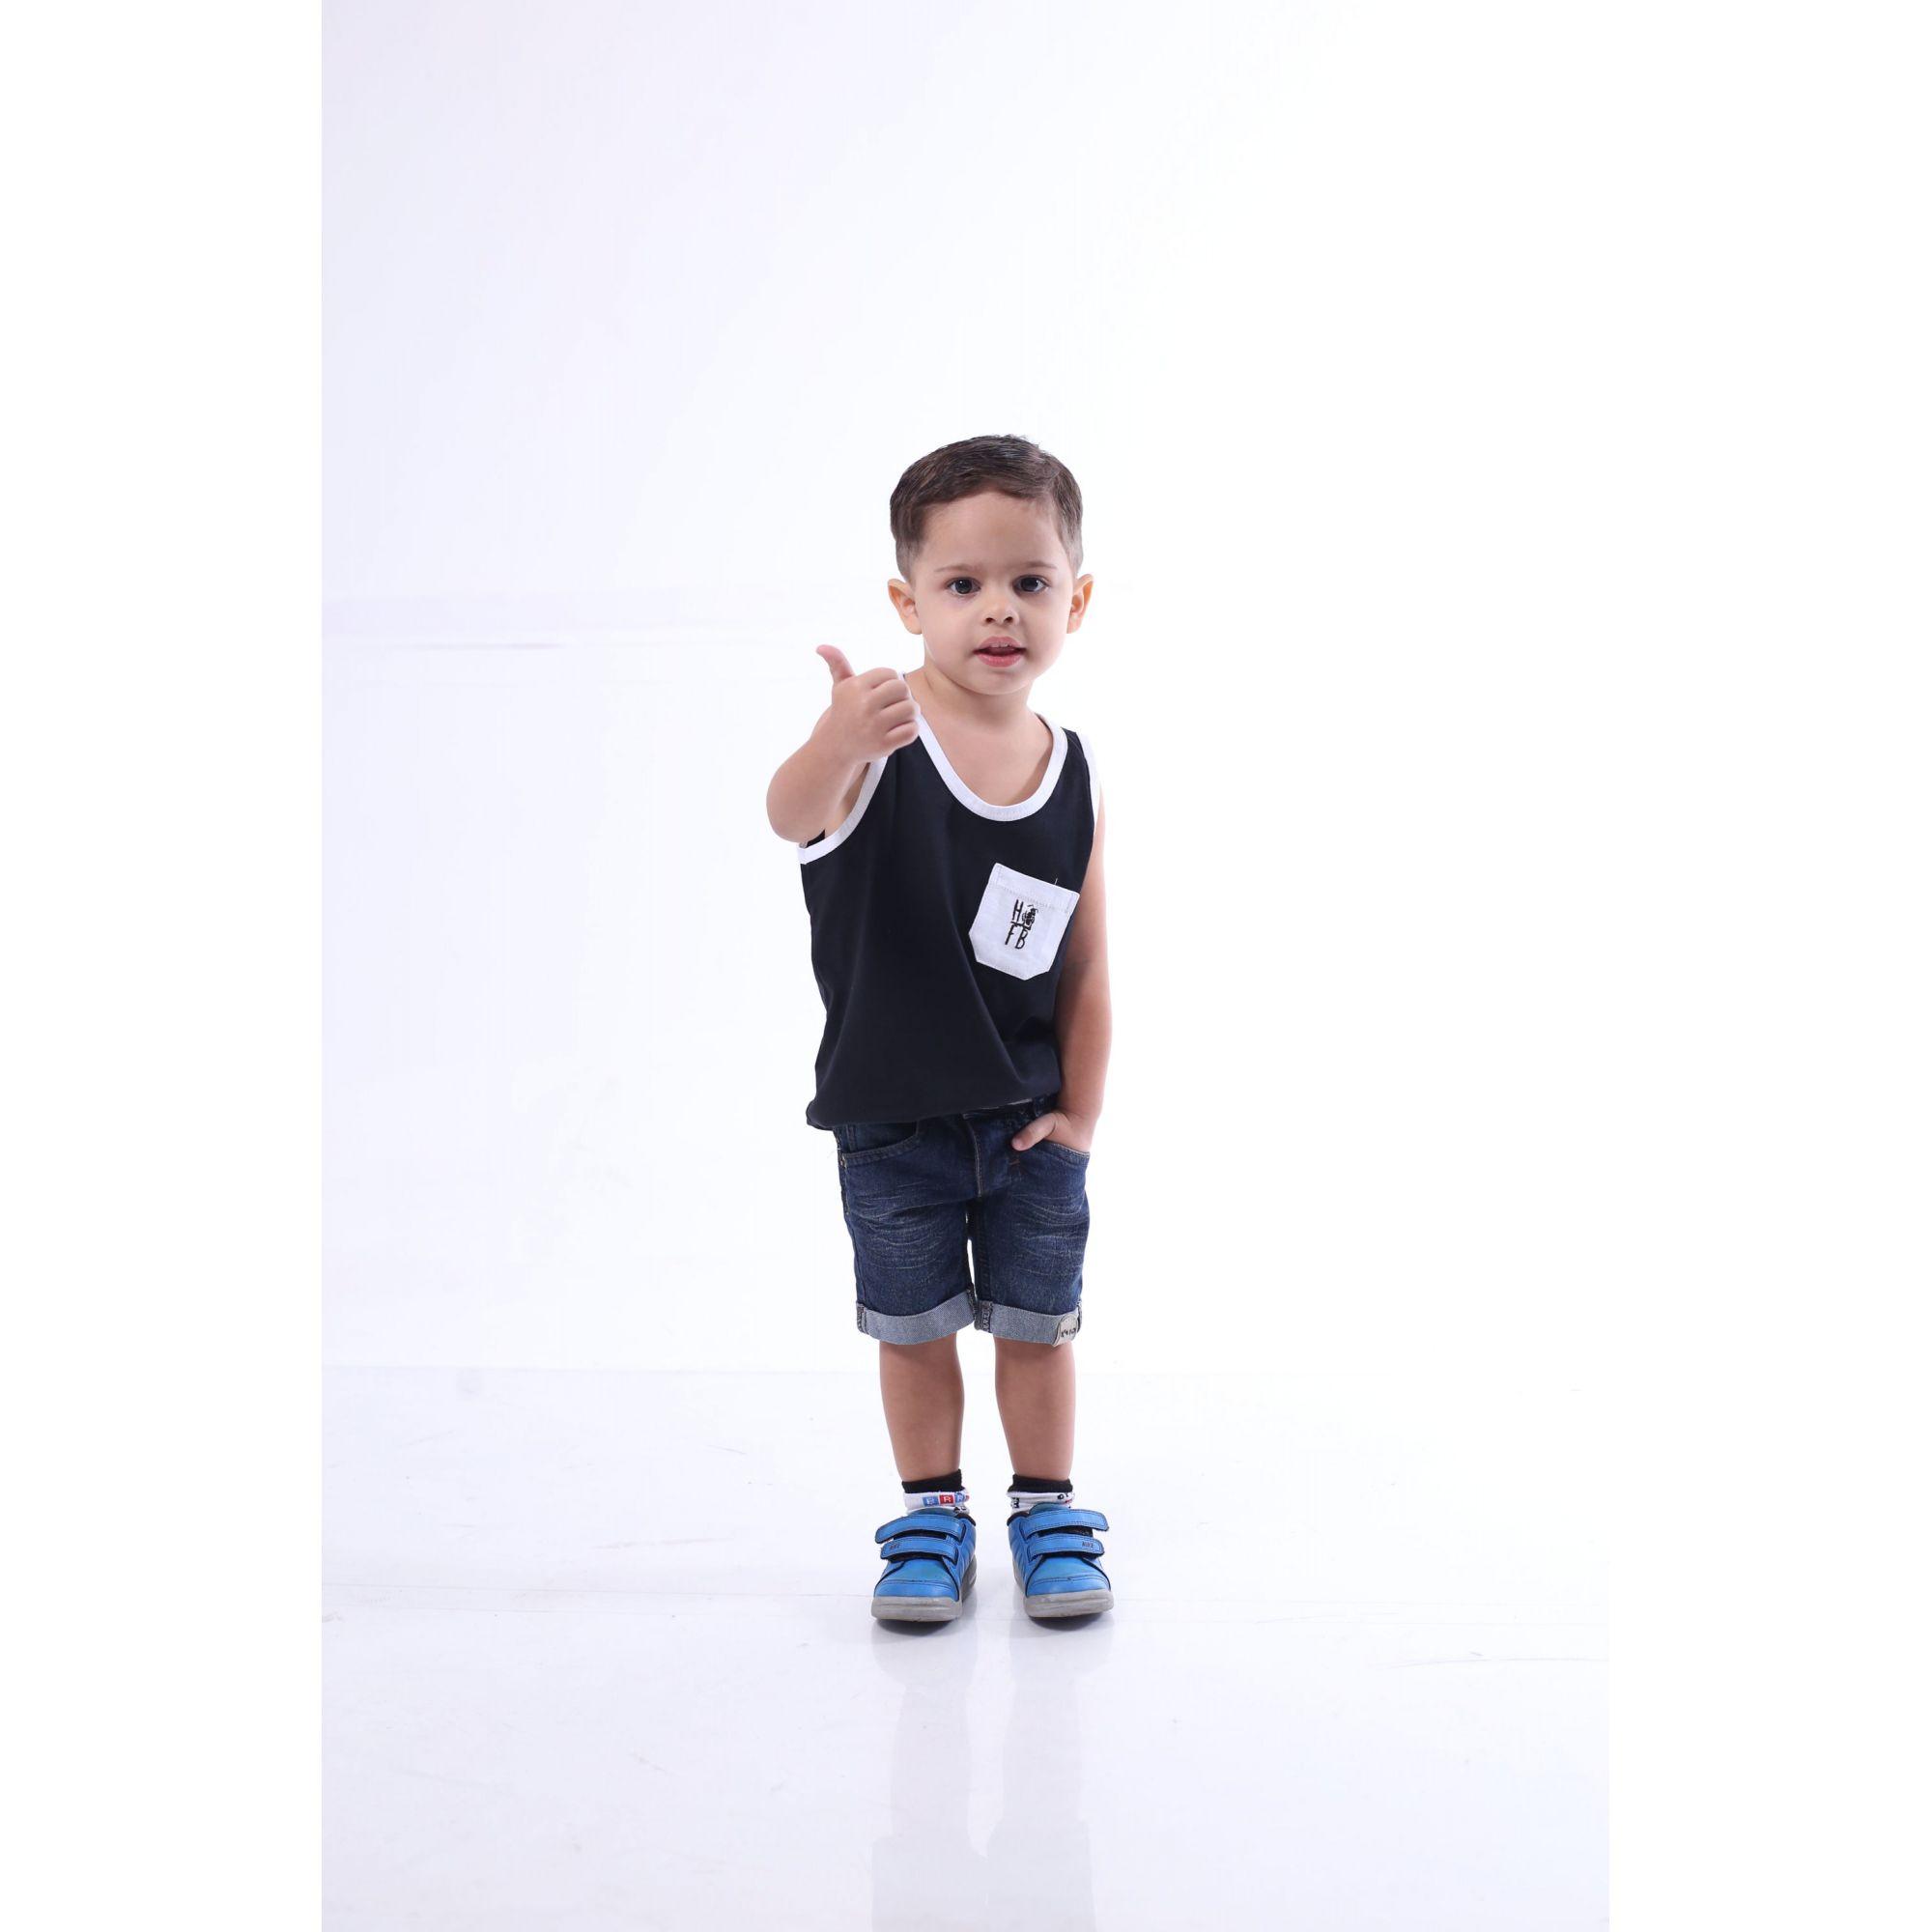 Regata Infantil Preta com Bolso Branco  - Heitor Fashion Brazil